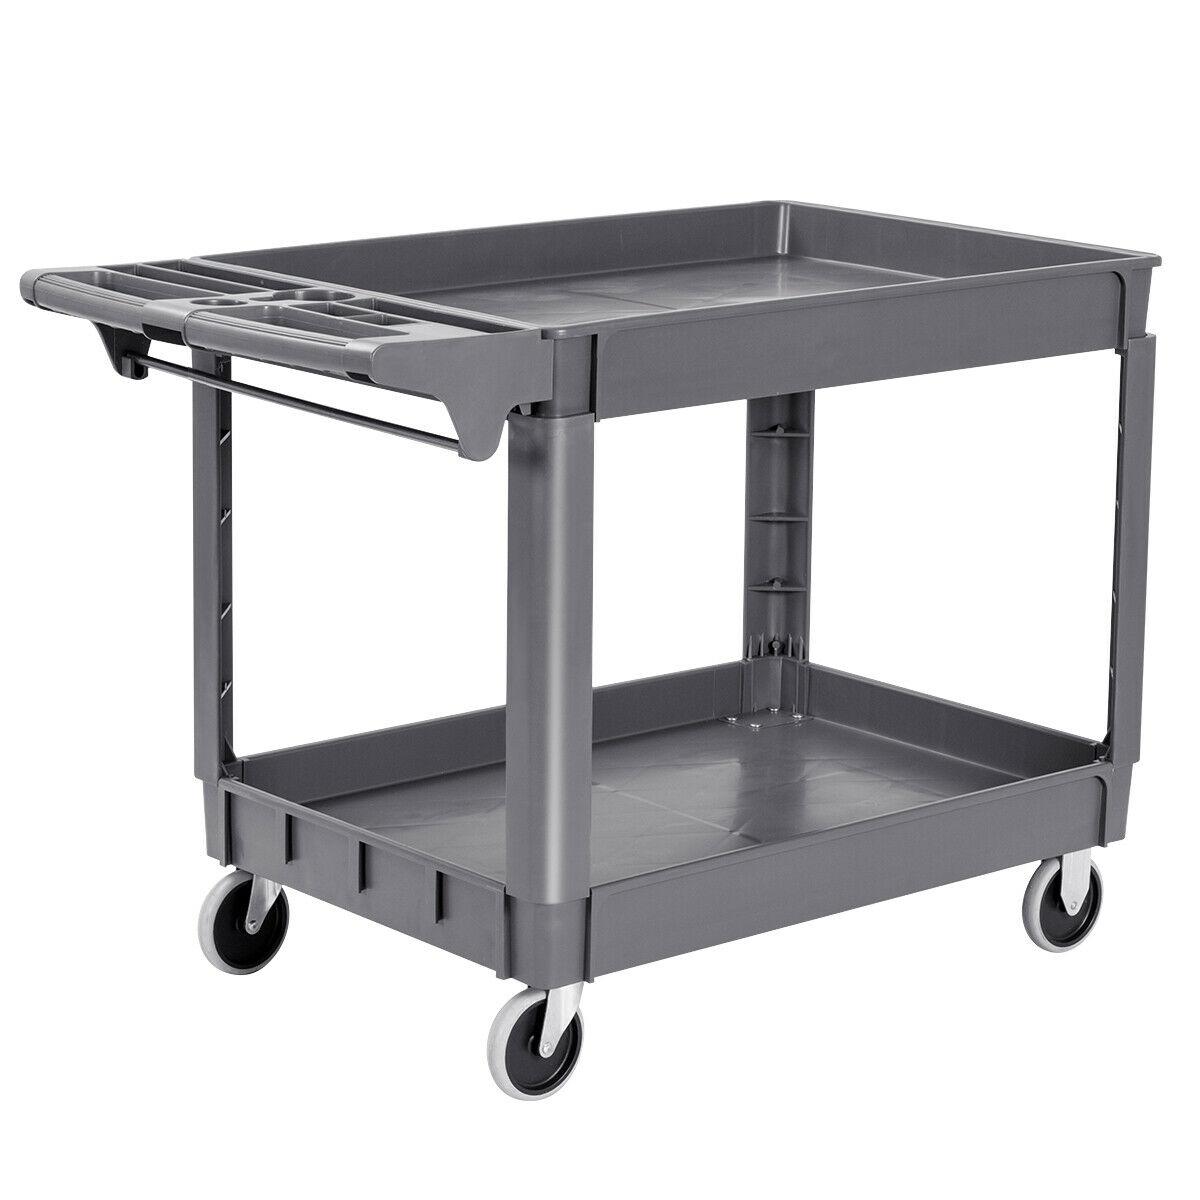 Costway Plastic Utility Service Cart 550 LBS Capacity 2 Shelves Rolling 46'' X 25'' X 33''